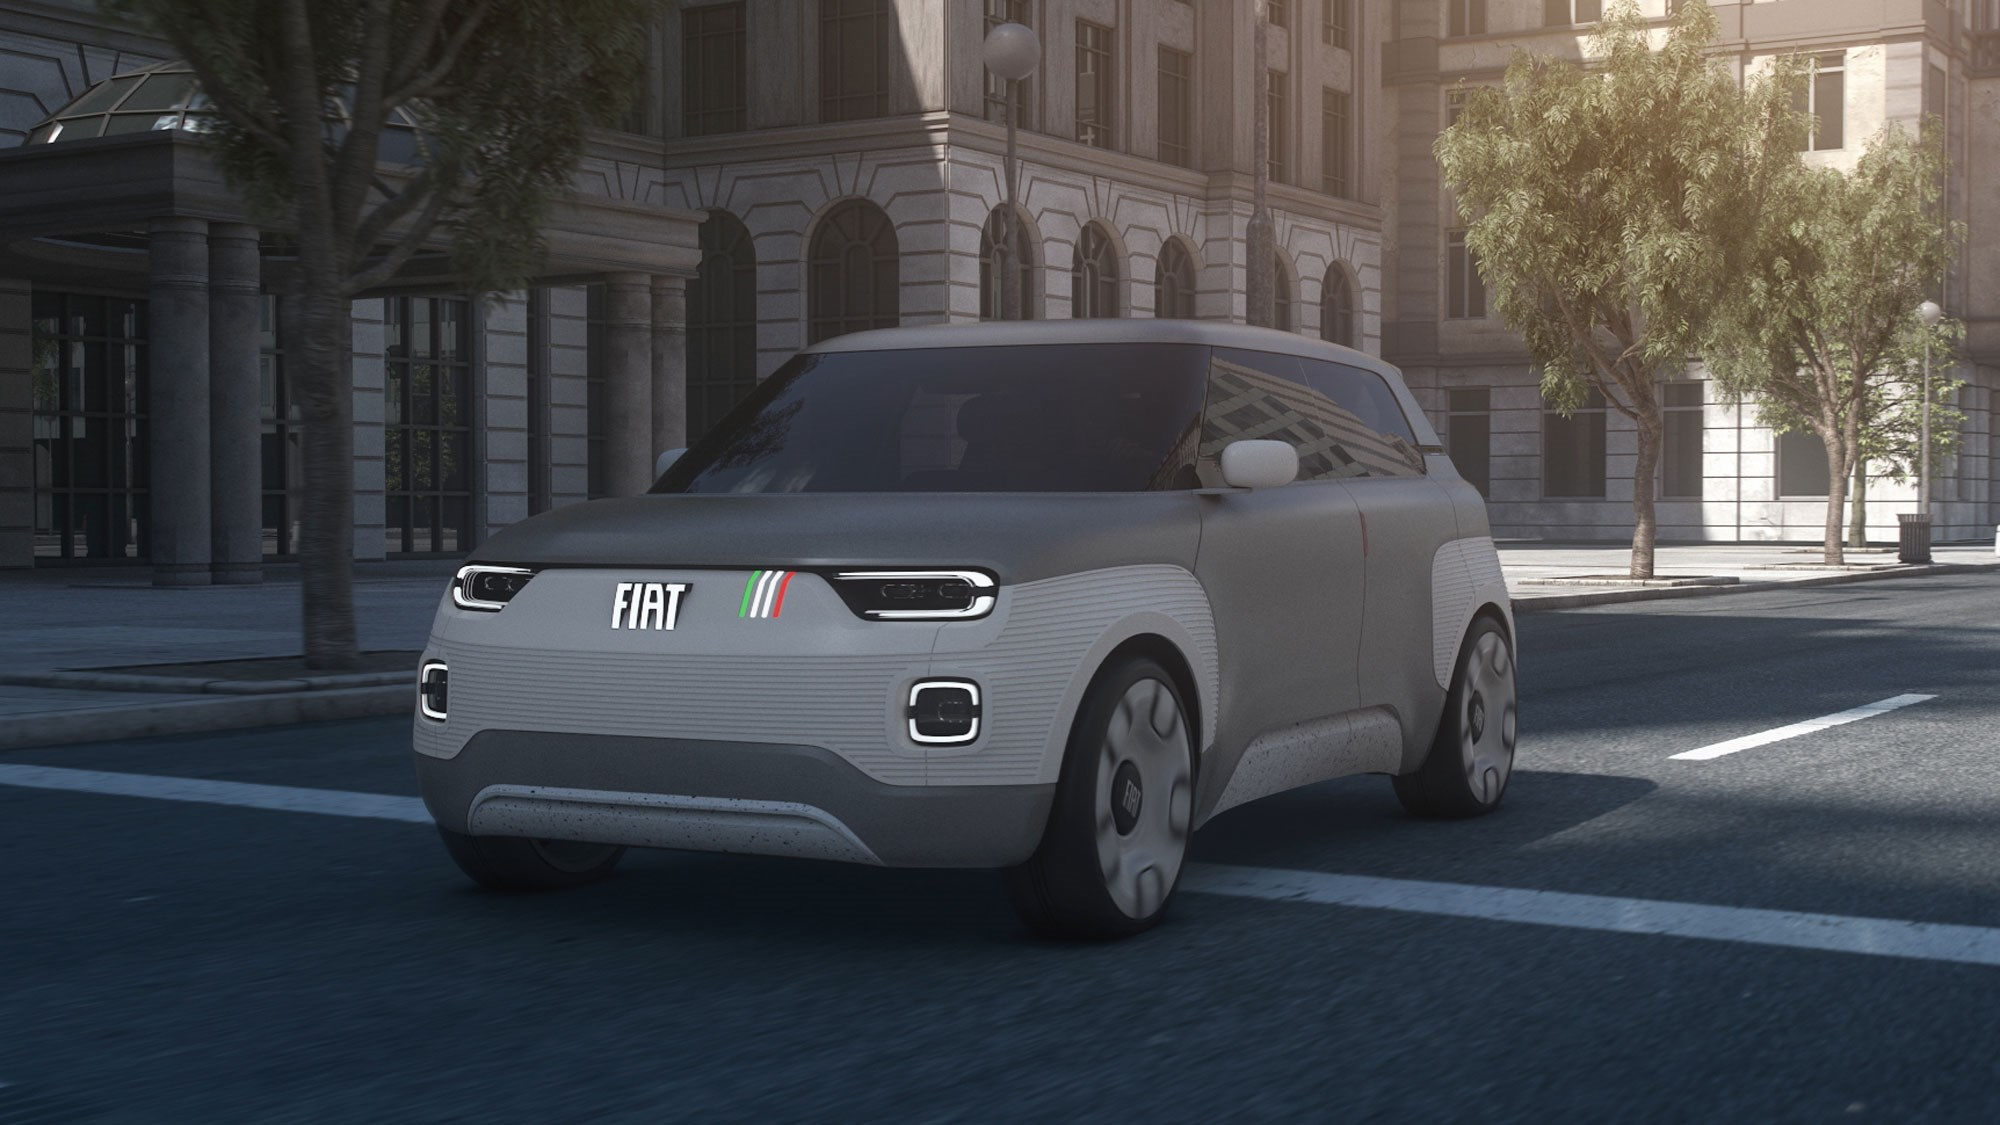 Fiat CentoVenti concept: is this the next Panda? | CAR Magazine